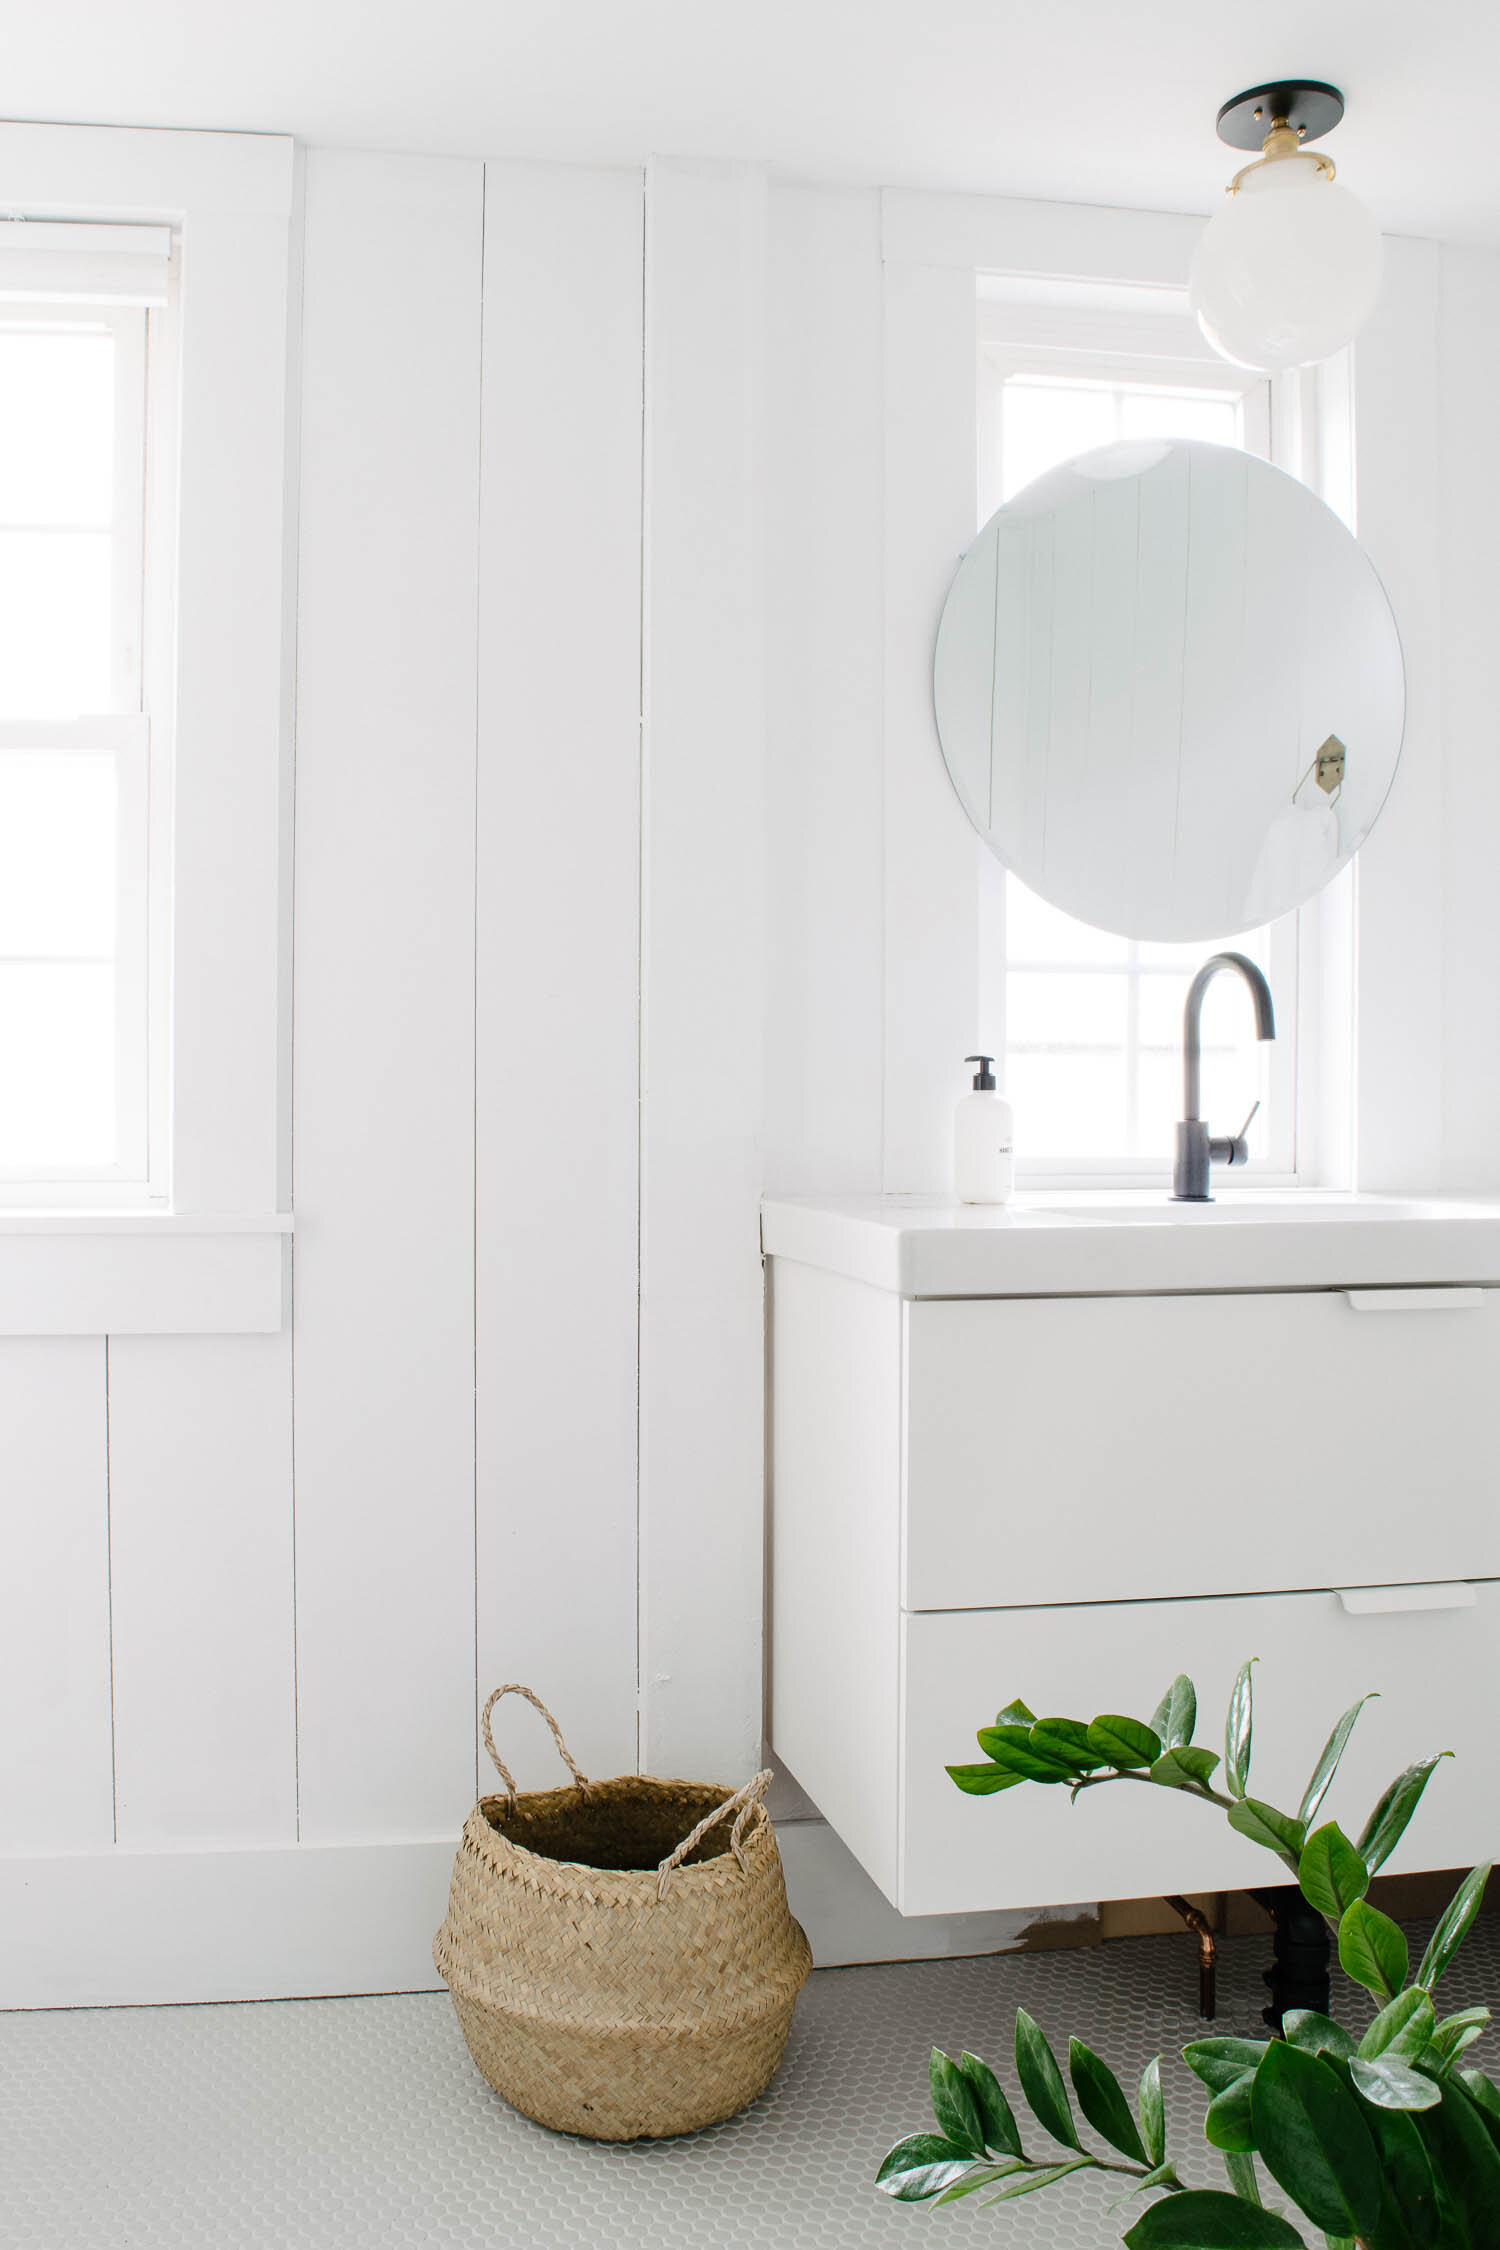 The $1,500 Historic Modern Bathroom Plan-2690.jpg